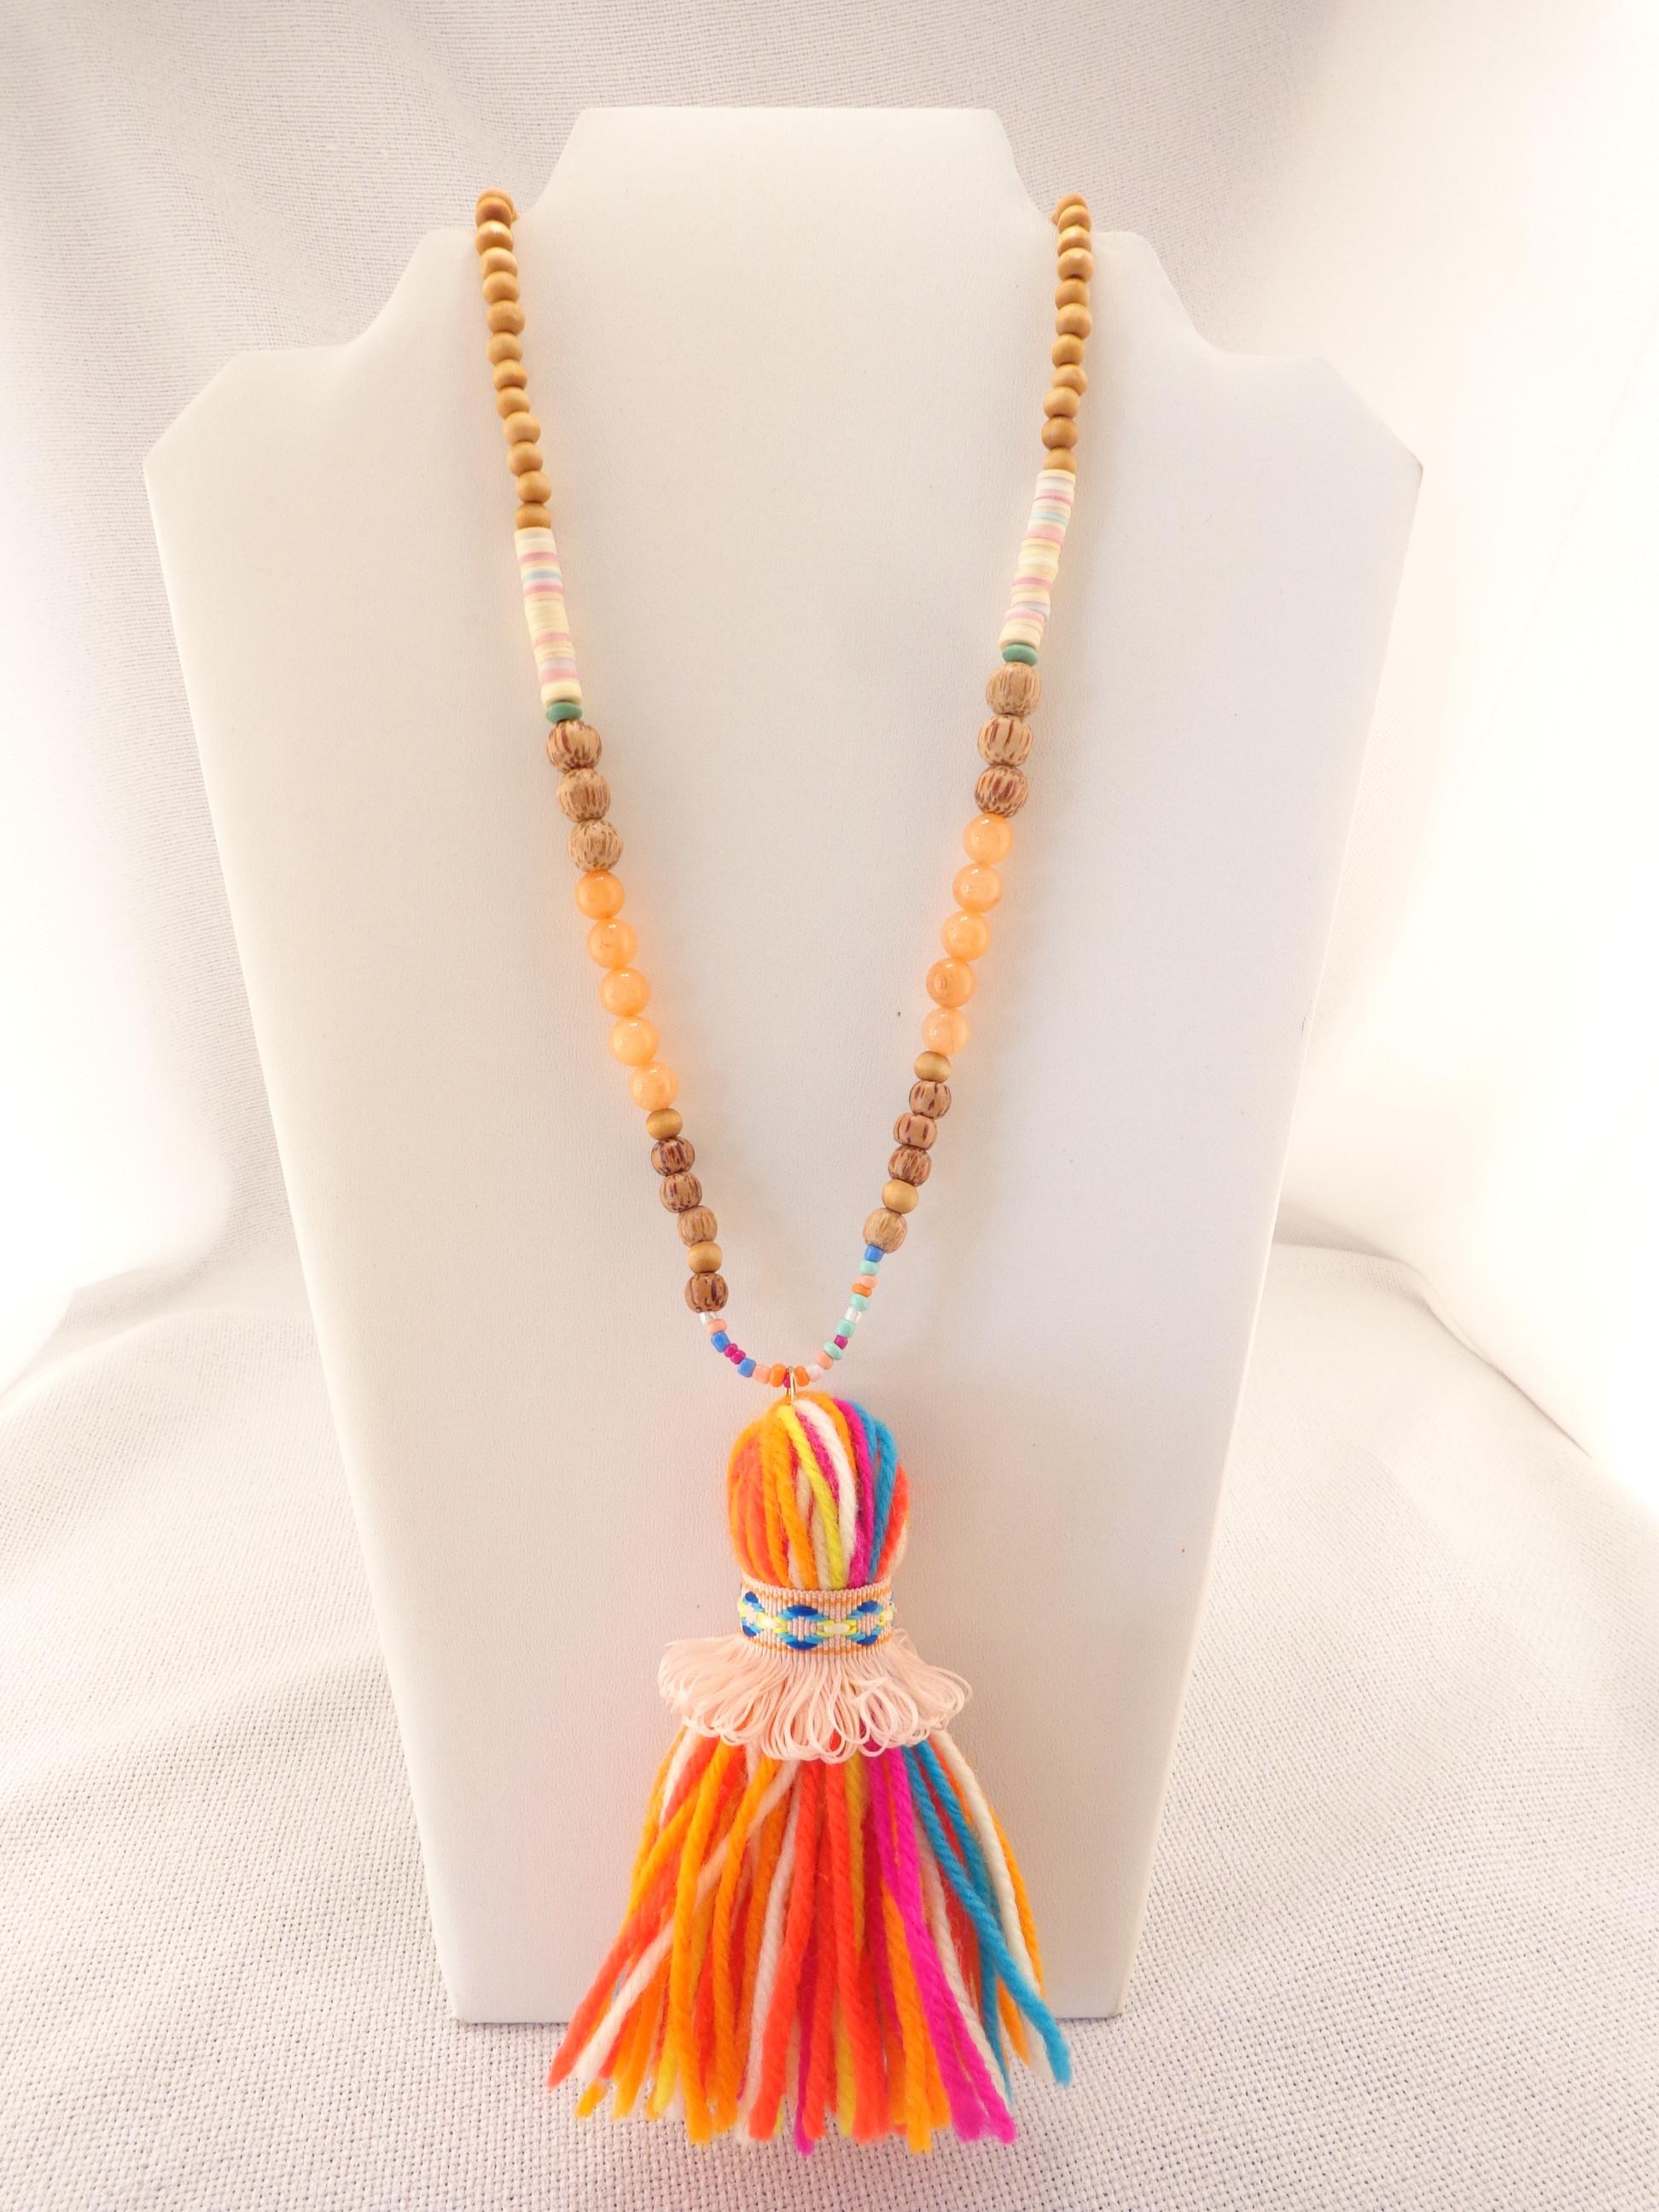 a6d05876f499f0 Wooden Bead Yarn Tassel Necklace - Orange | Lydia Lister Jewelry